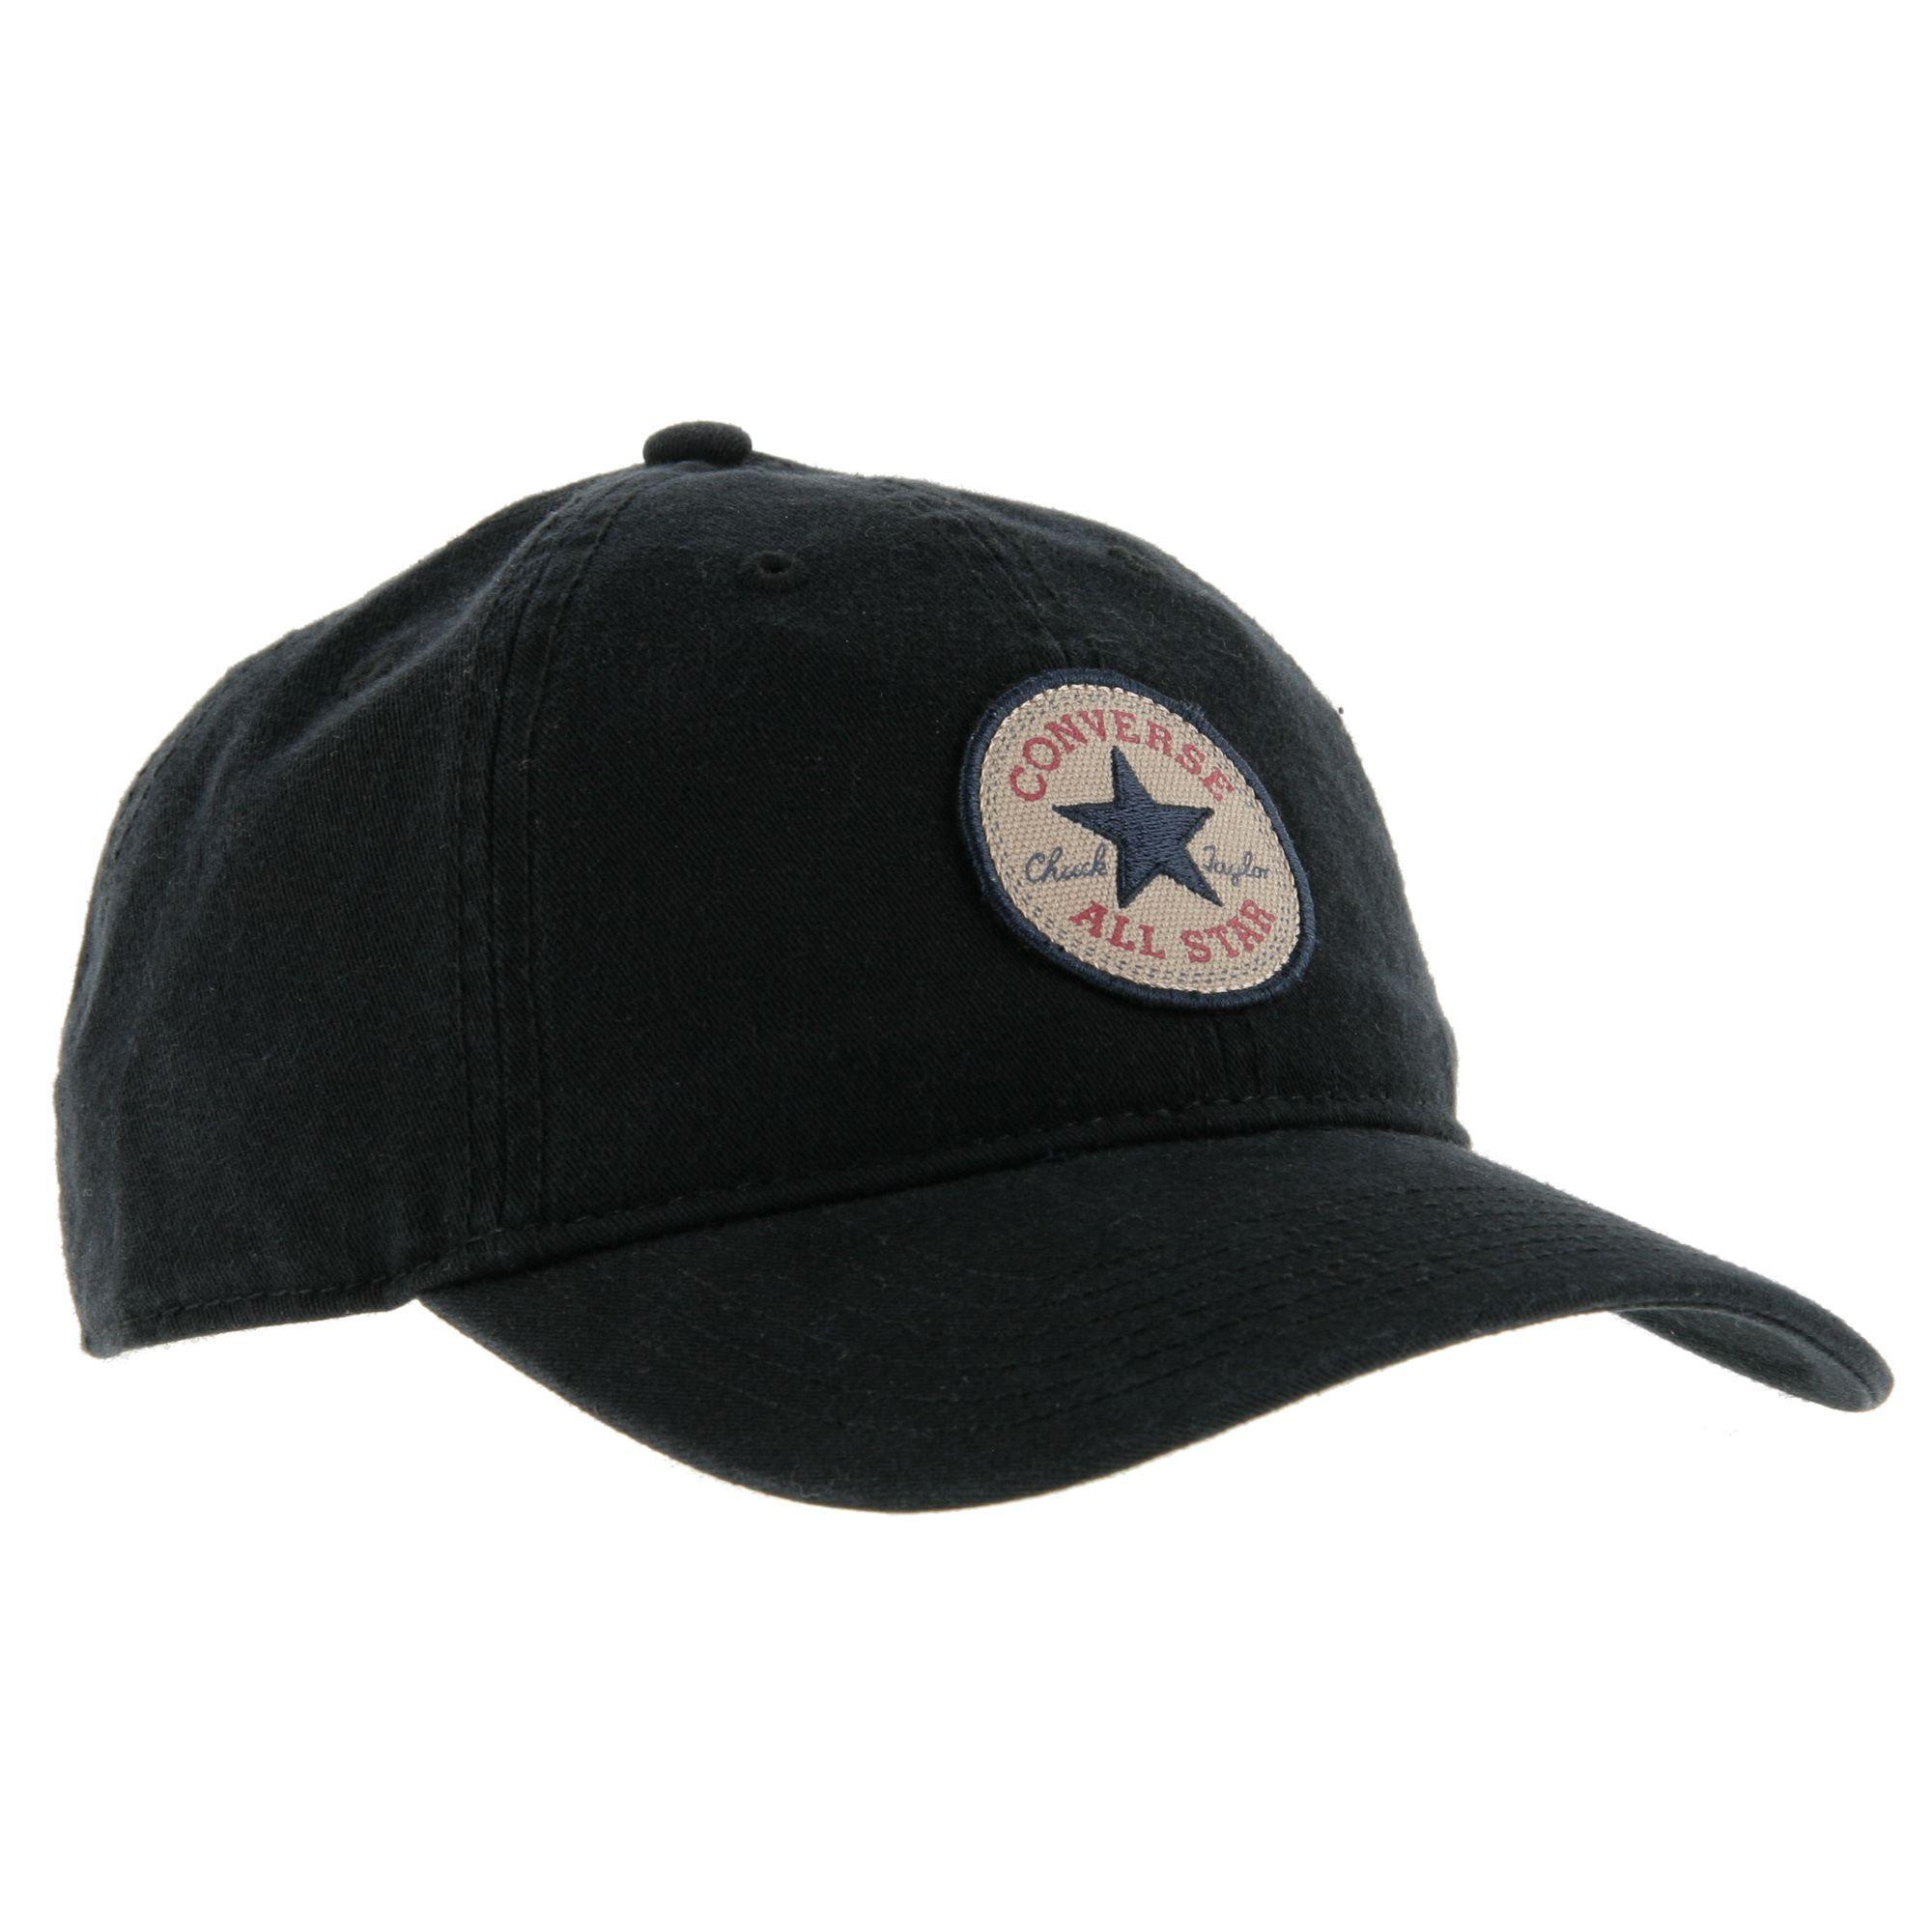 converse tip off baseball cap